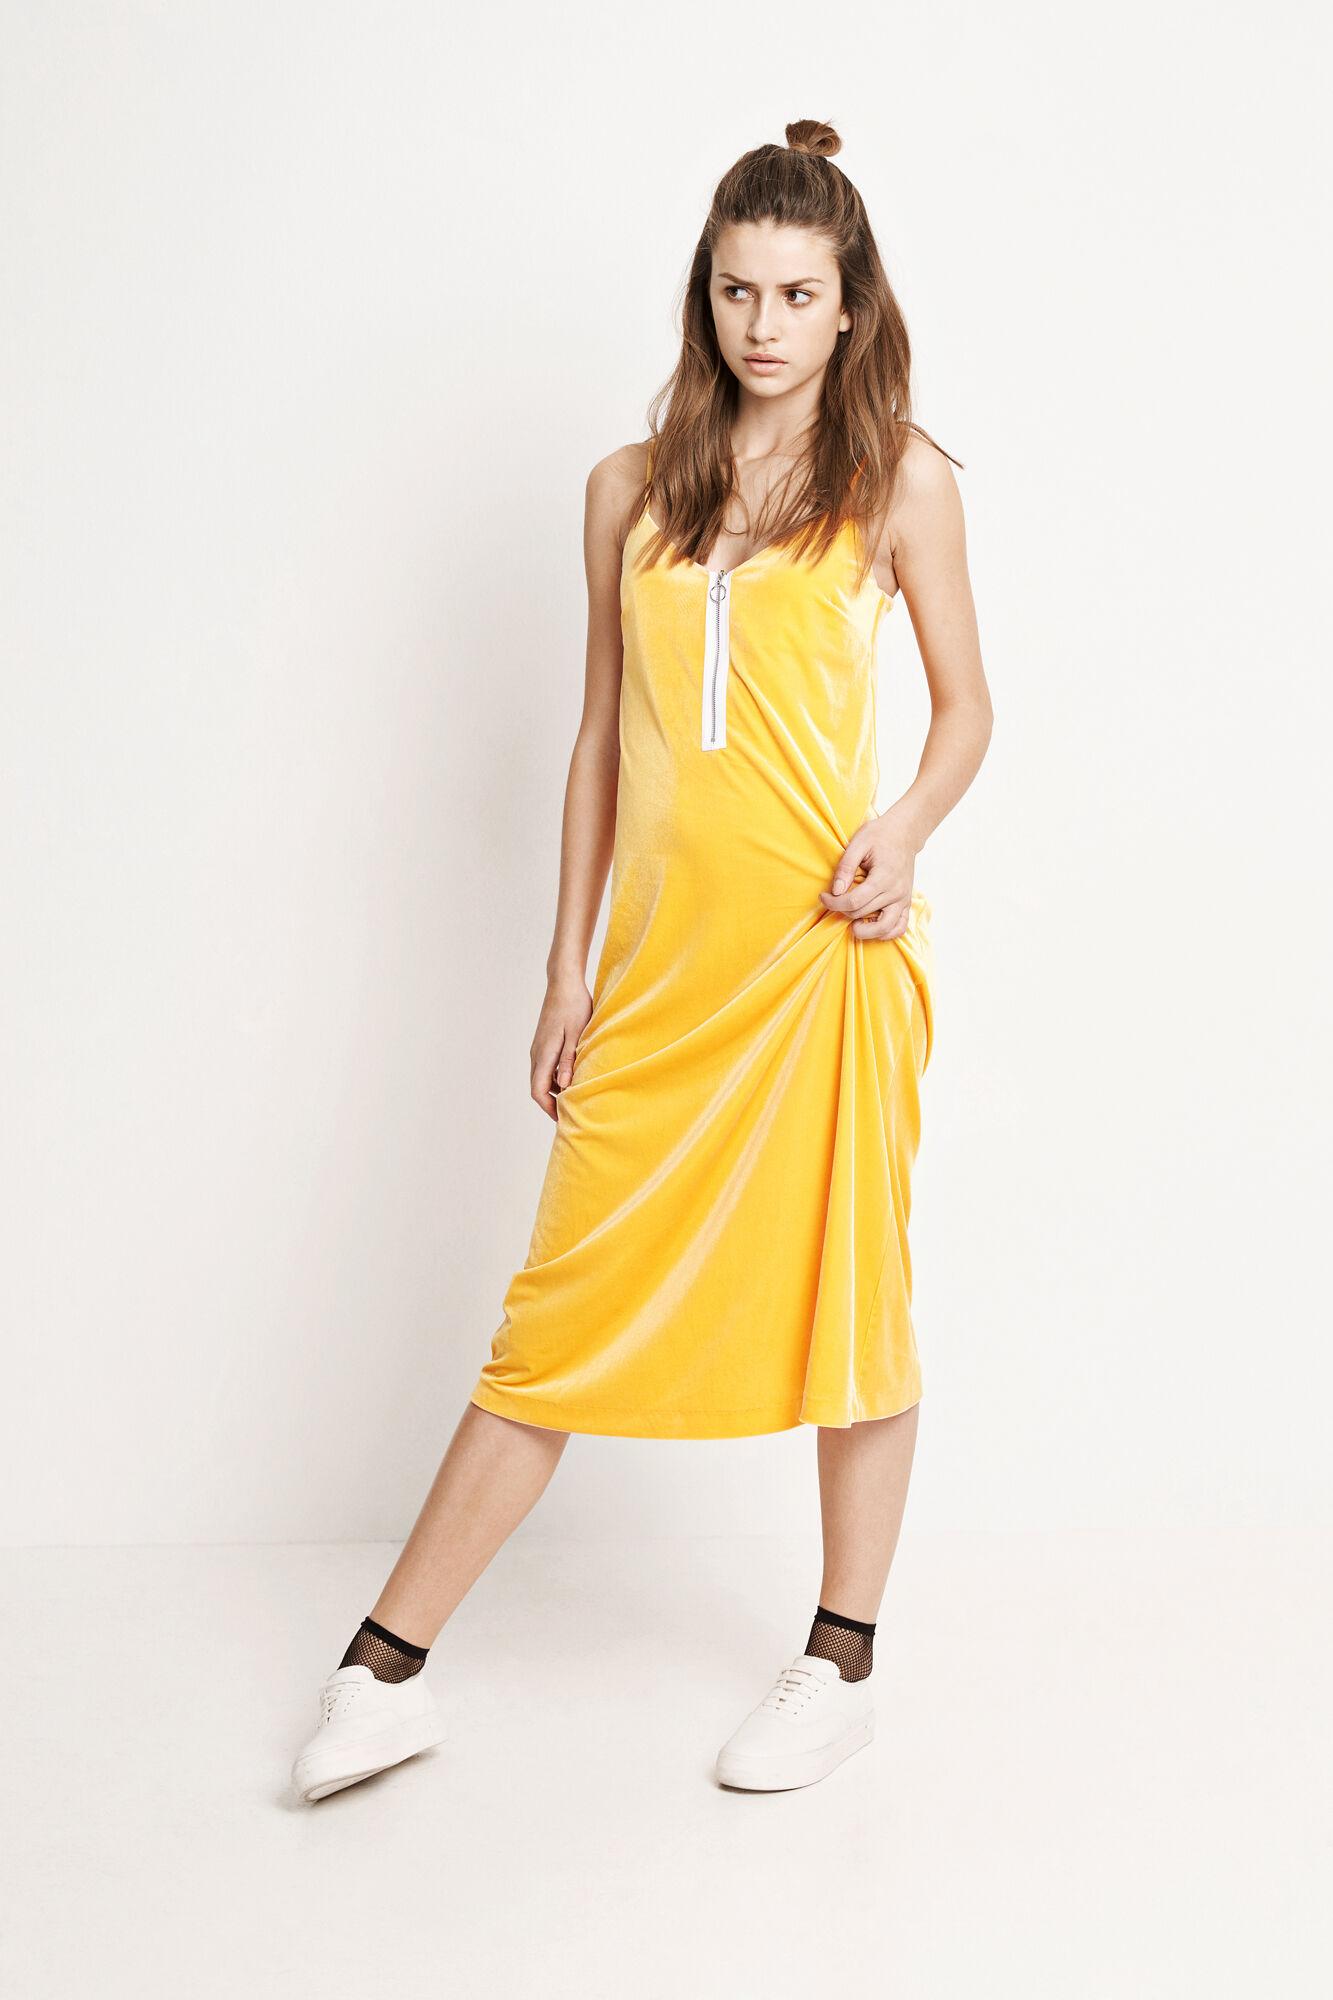 ENREGINA SL DRESS 5912, RADIENT YELLOW